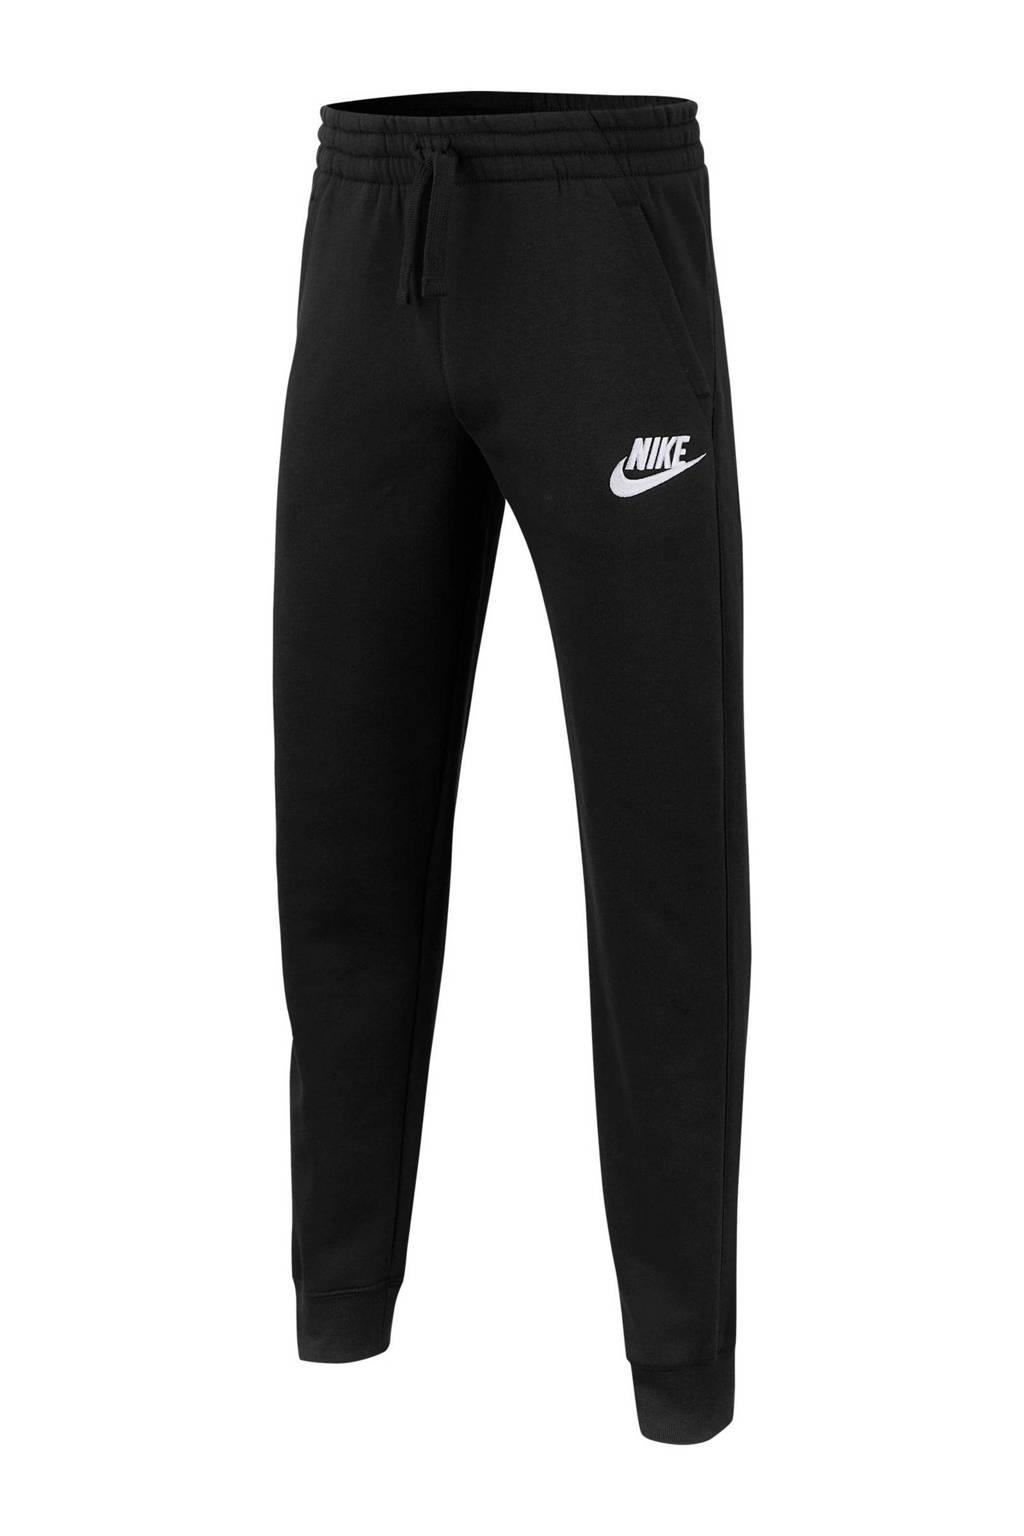 Nike regular fit joggingbroek zwart, Zwart/wit